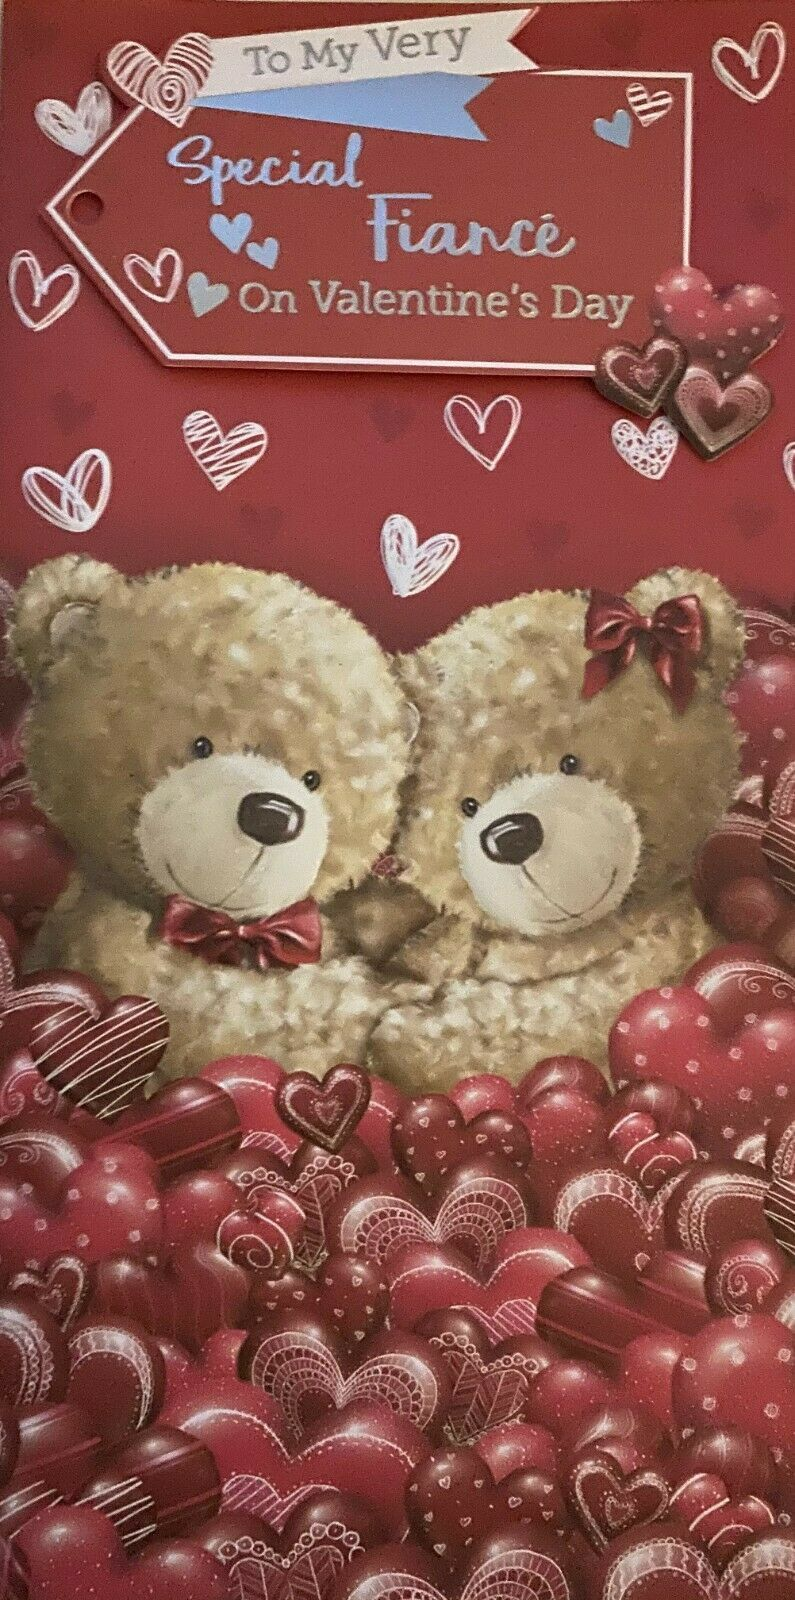 Valentine's Day Card To My Very Special Fiancé On Valentine's Day